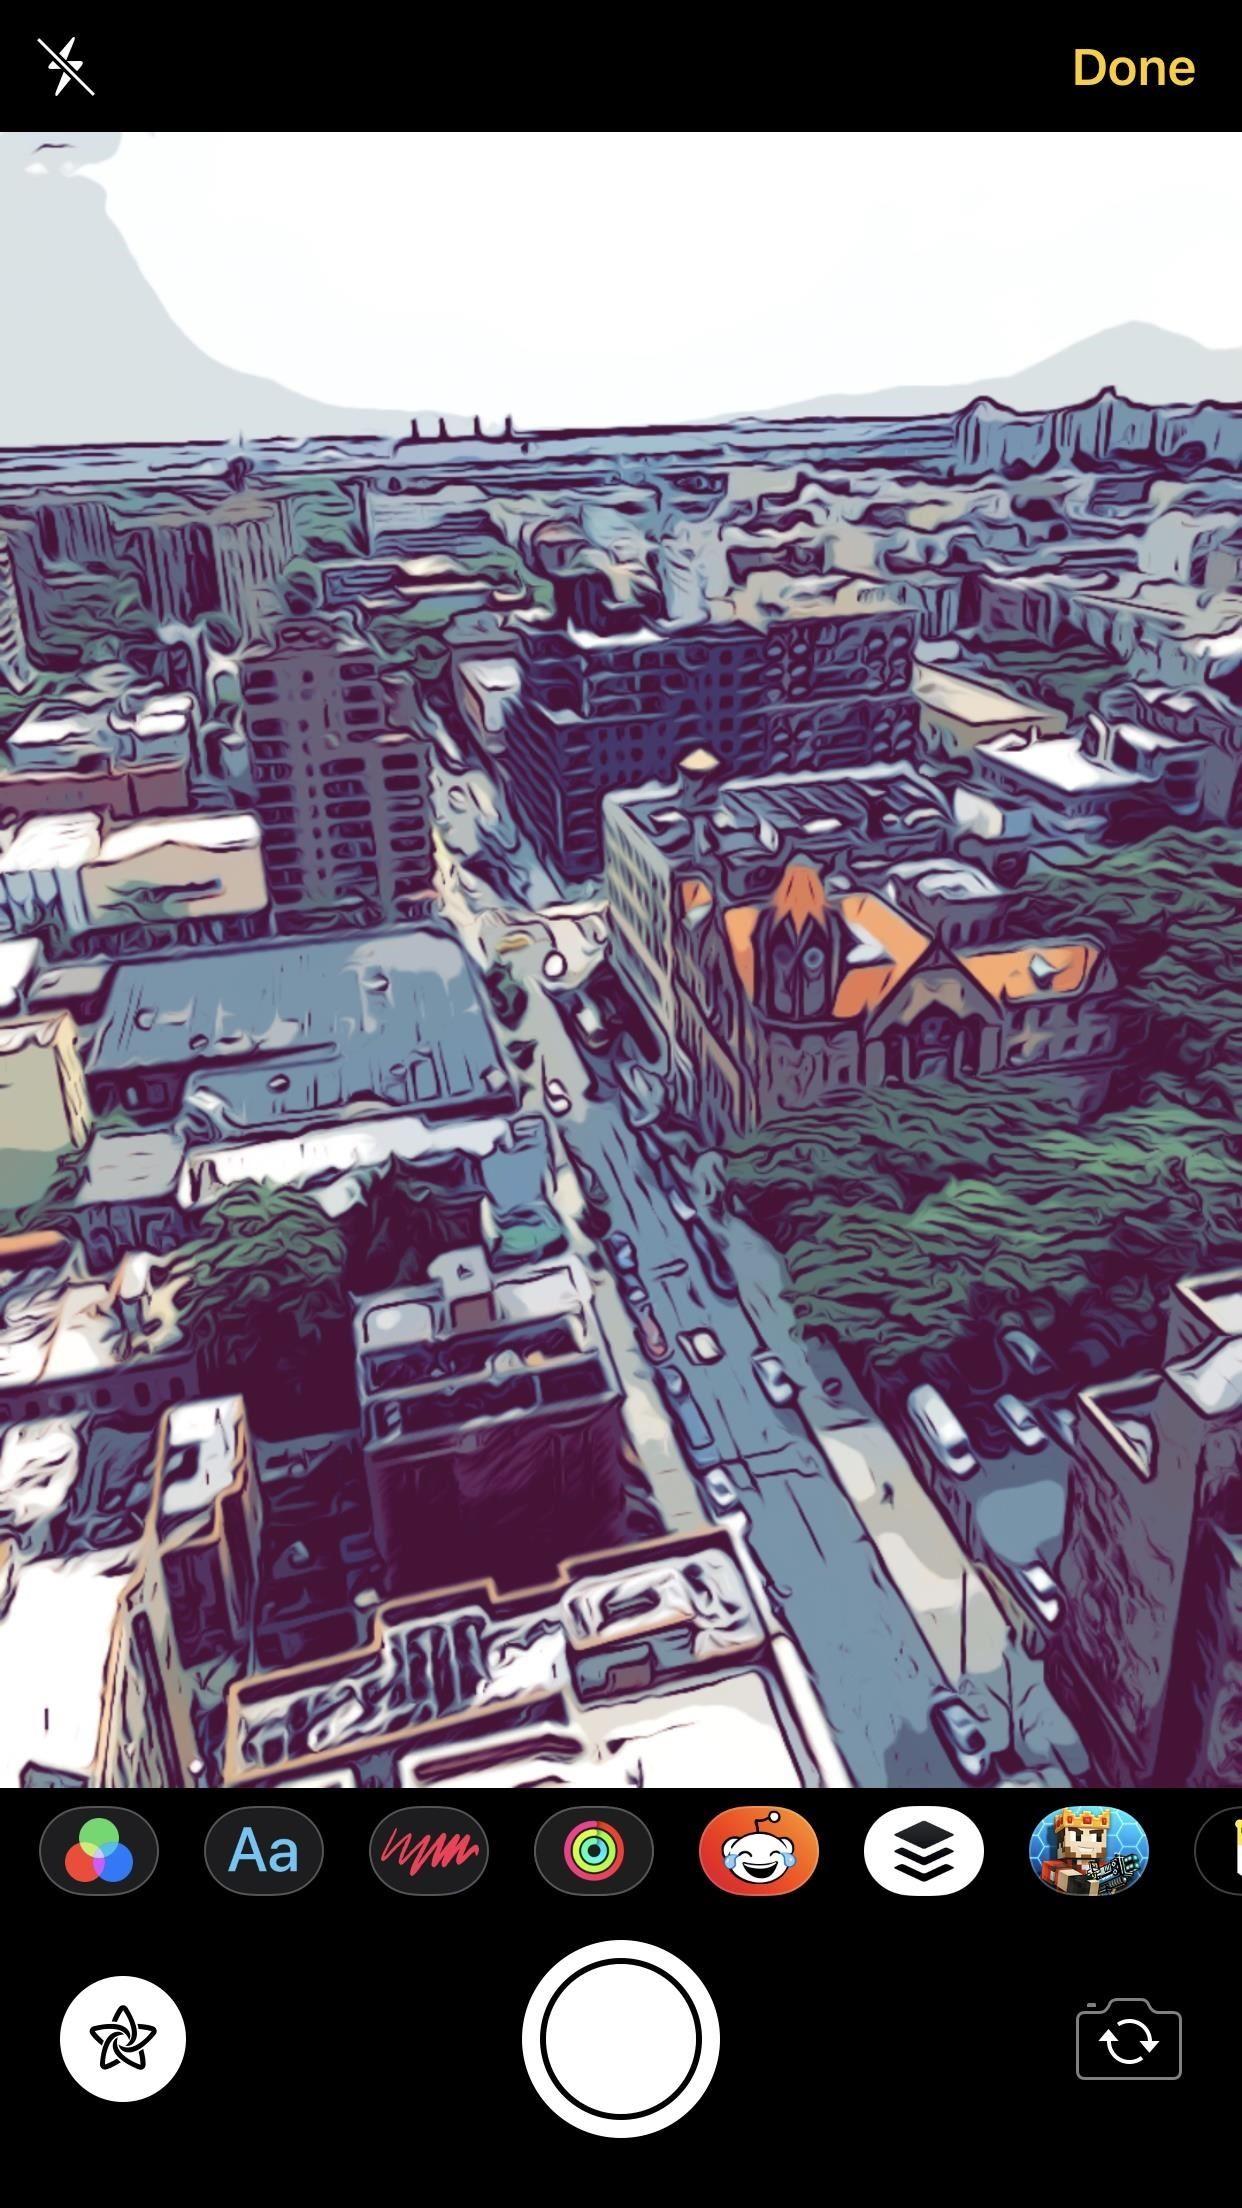 gizli iphone filtresi comic book